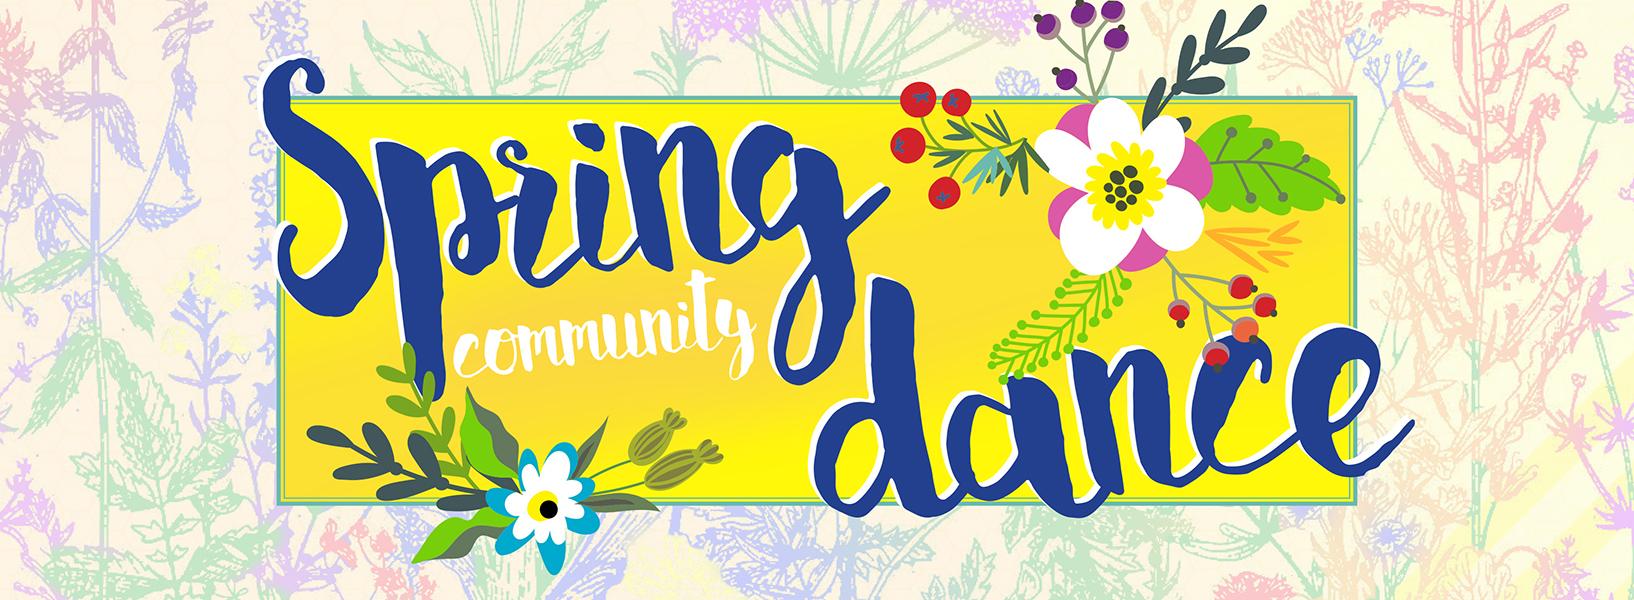 Spring Community Dance 4/13/18   Mead Montessori School